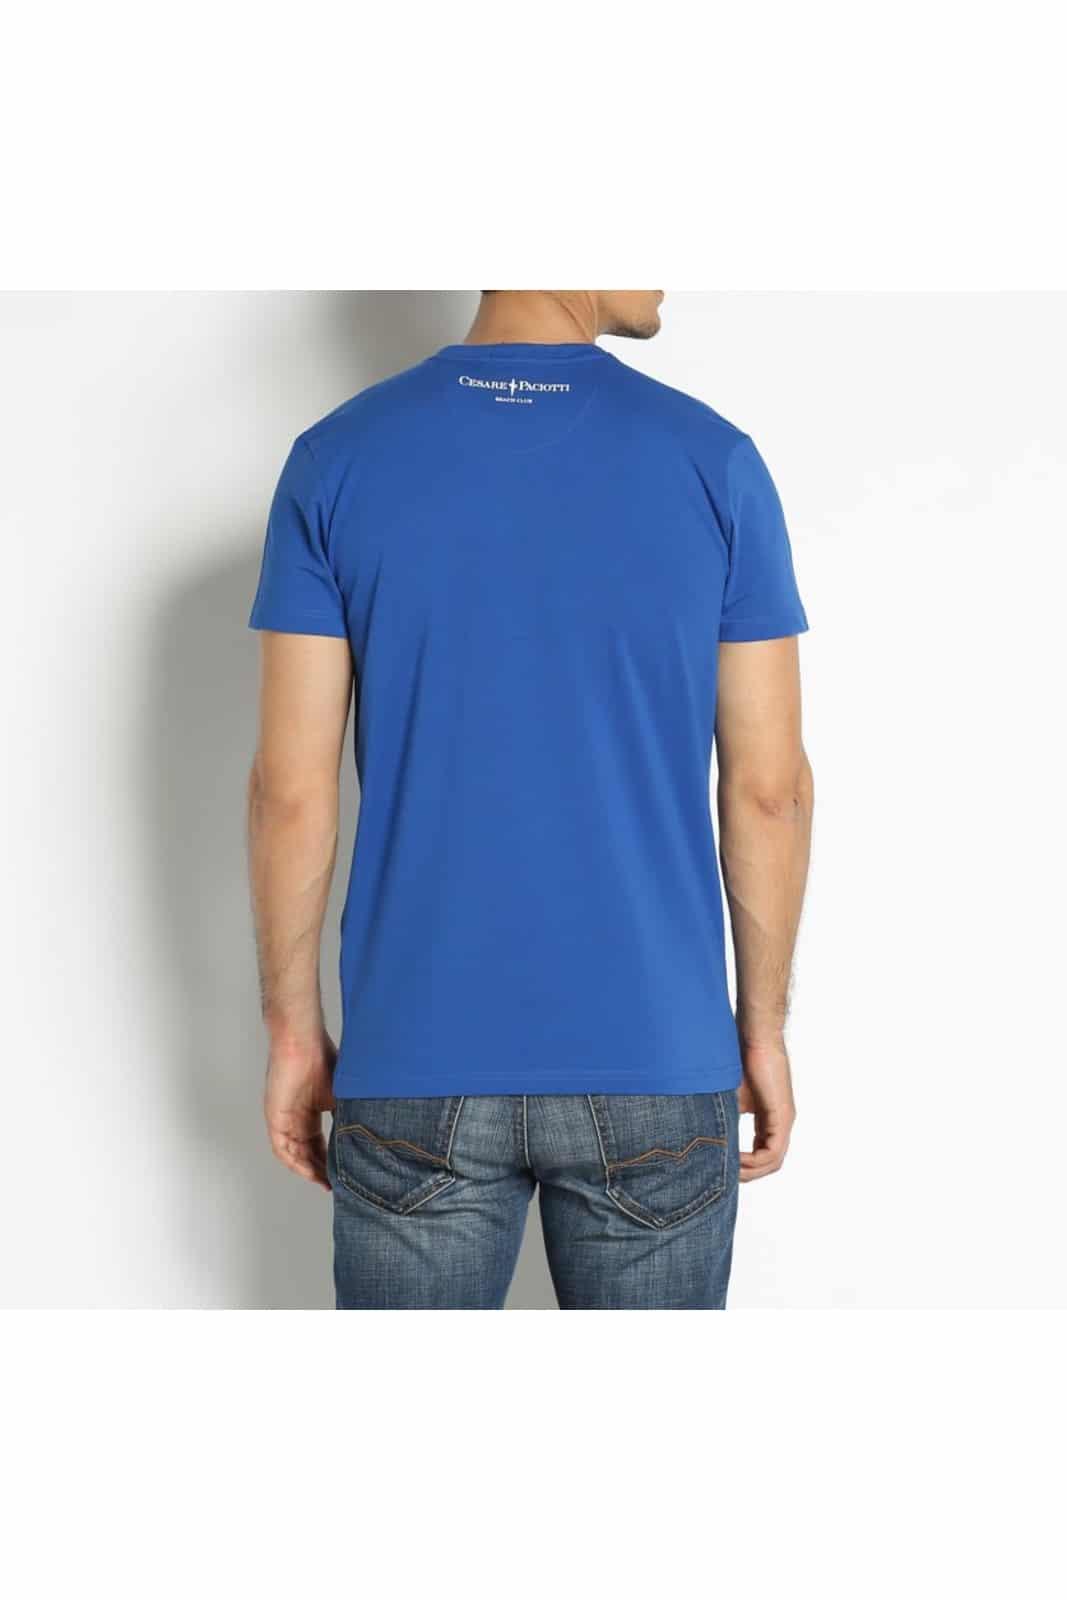 5c2aa5ec ▷ SelfOutlet.com: Cesare Paciotti T-Shirts for men — Supplier of ...